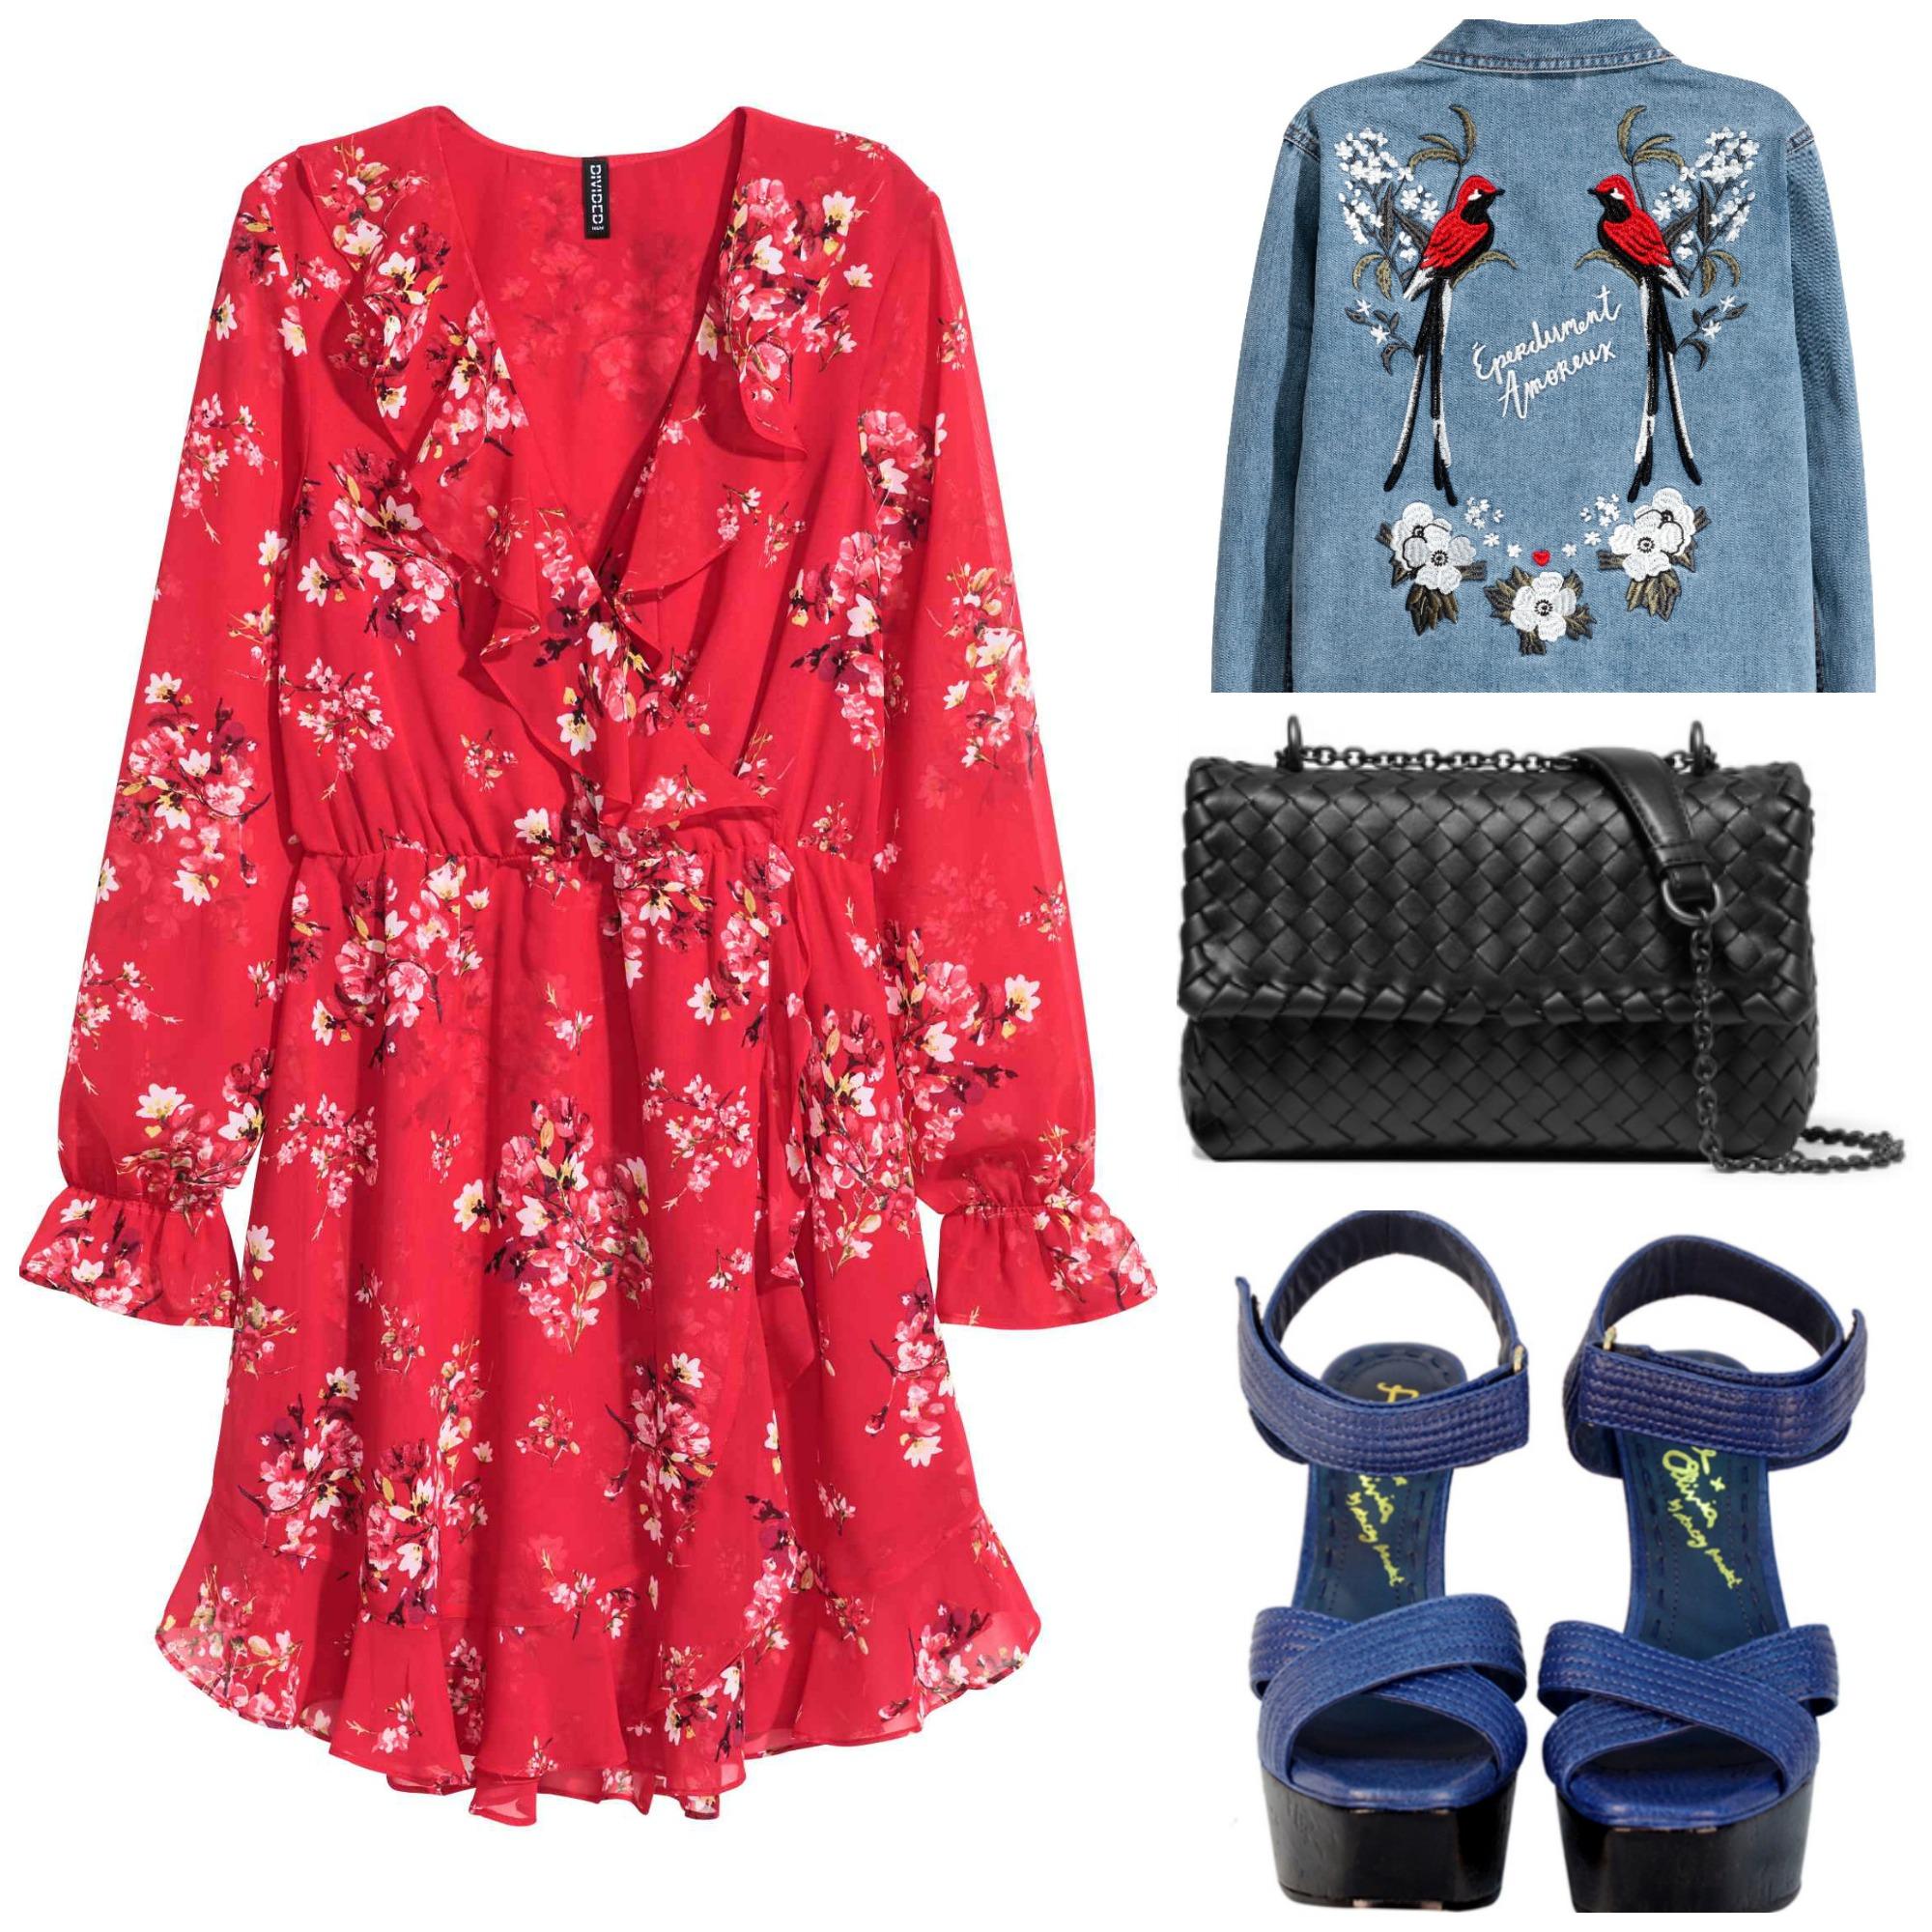 Dress and Jacket: H&M, Bag: Bottega Veneta (Net-A-Porter), Sandals: Alice + Olivia (RockNShop)